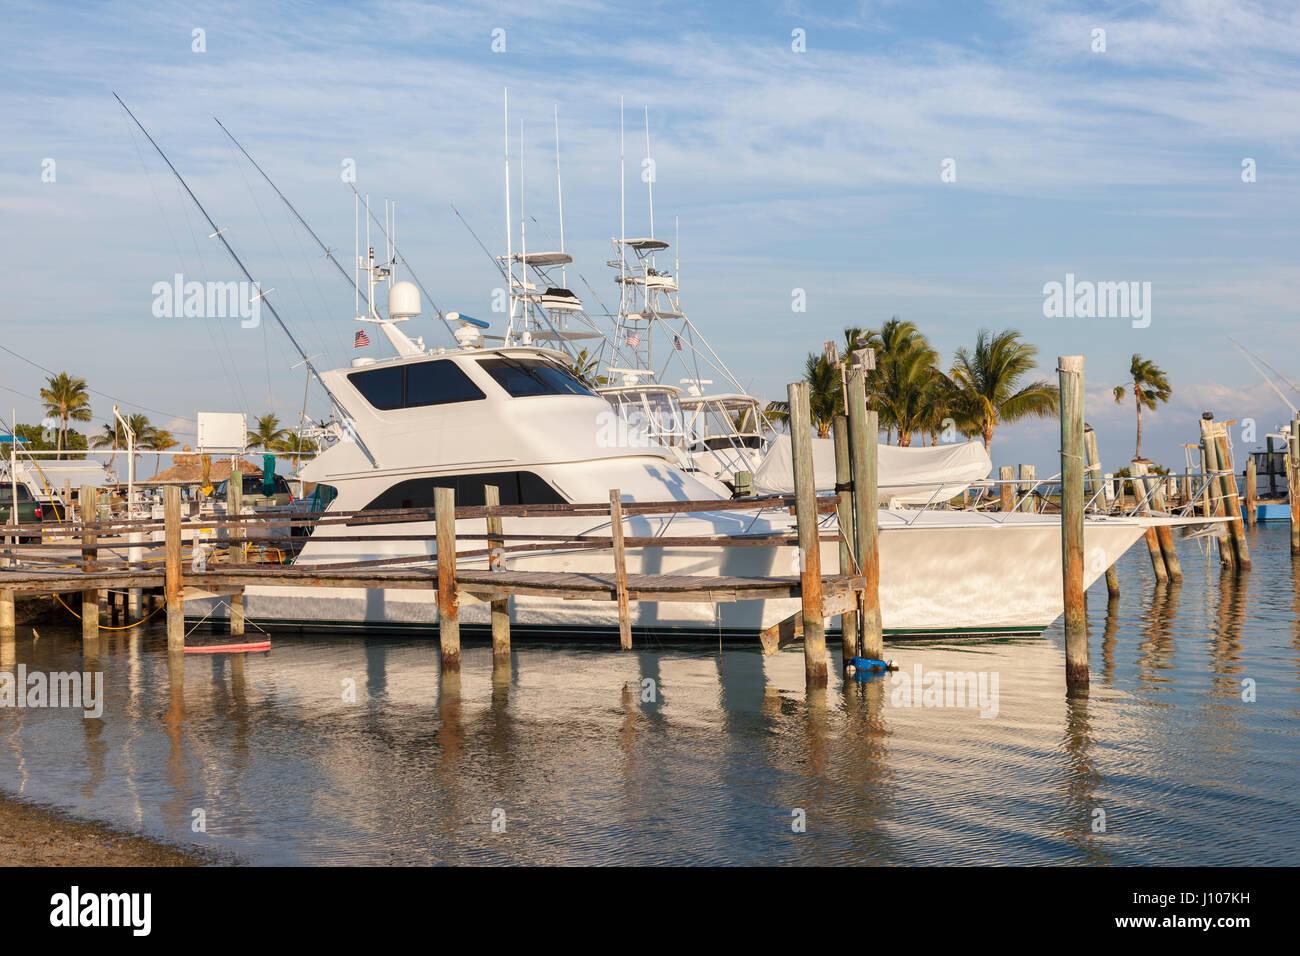 Deep sea fishing boats in the marina of Marathon Key. Florida, United States - Stock Image